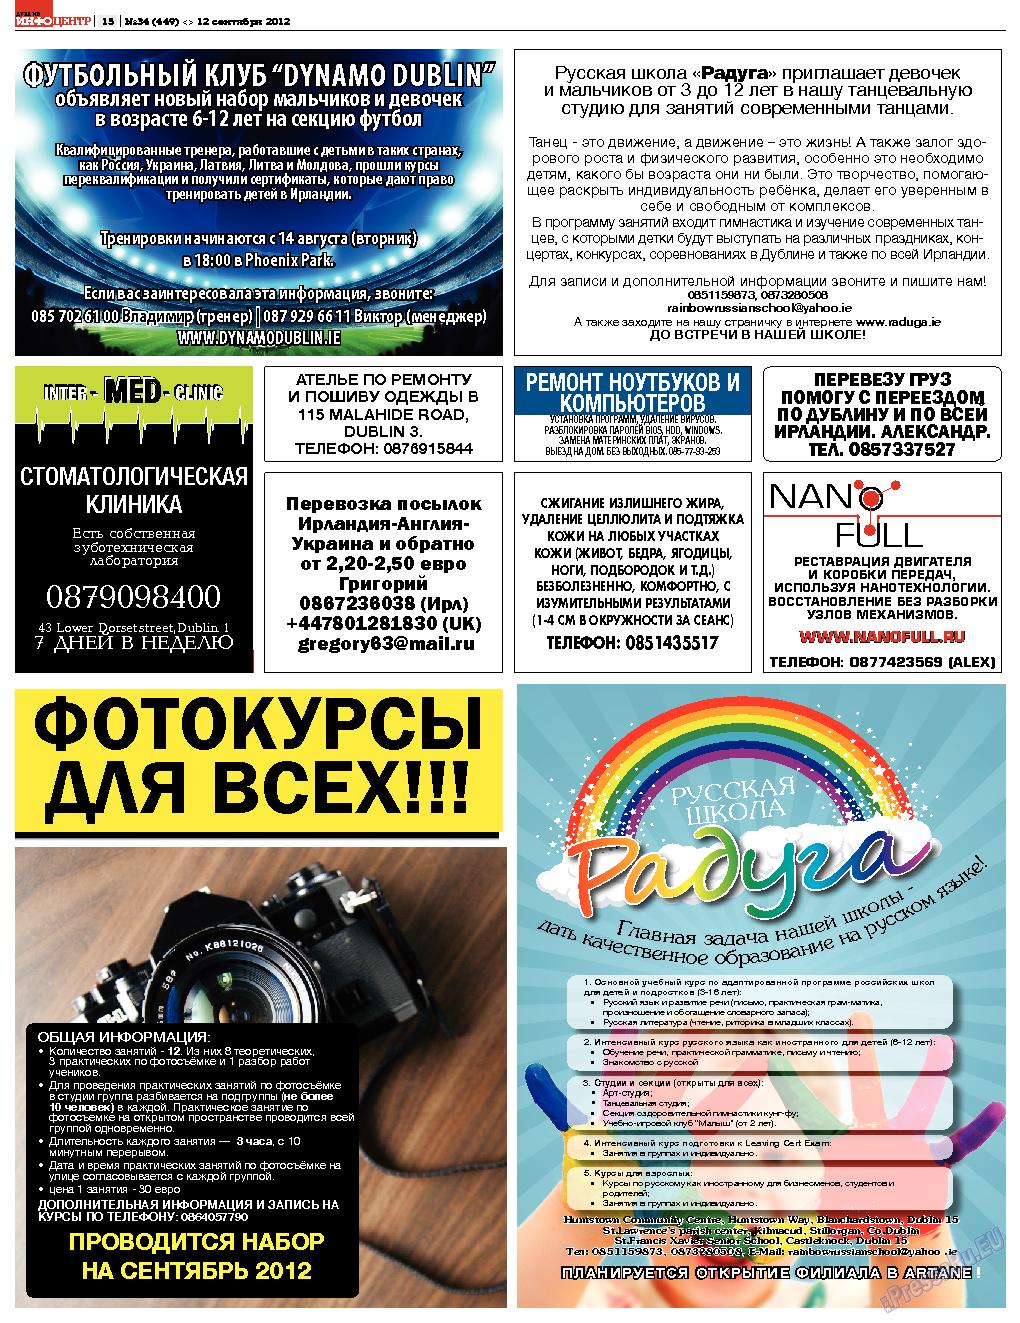 Дублин инфоцентр (газета). 2012 год, номер 34, стр. 15